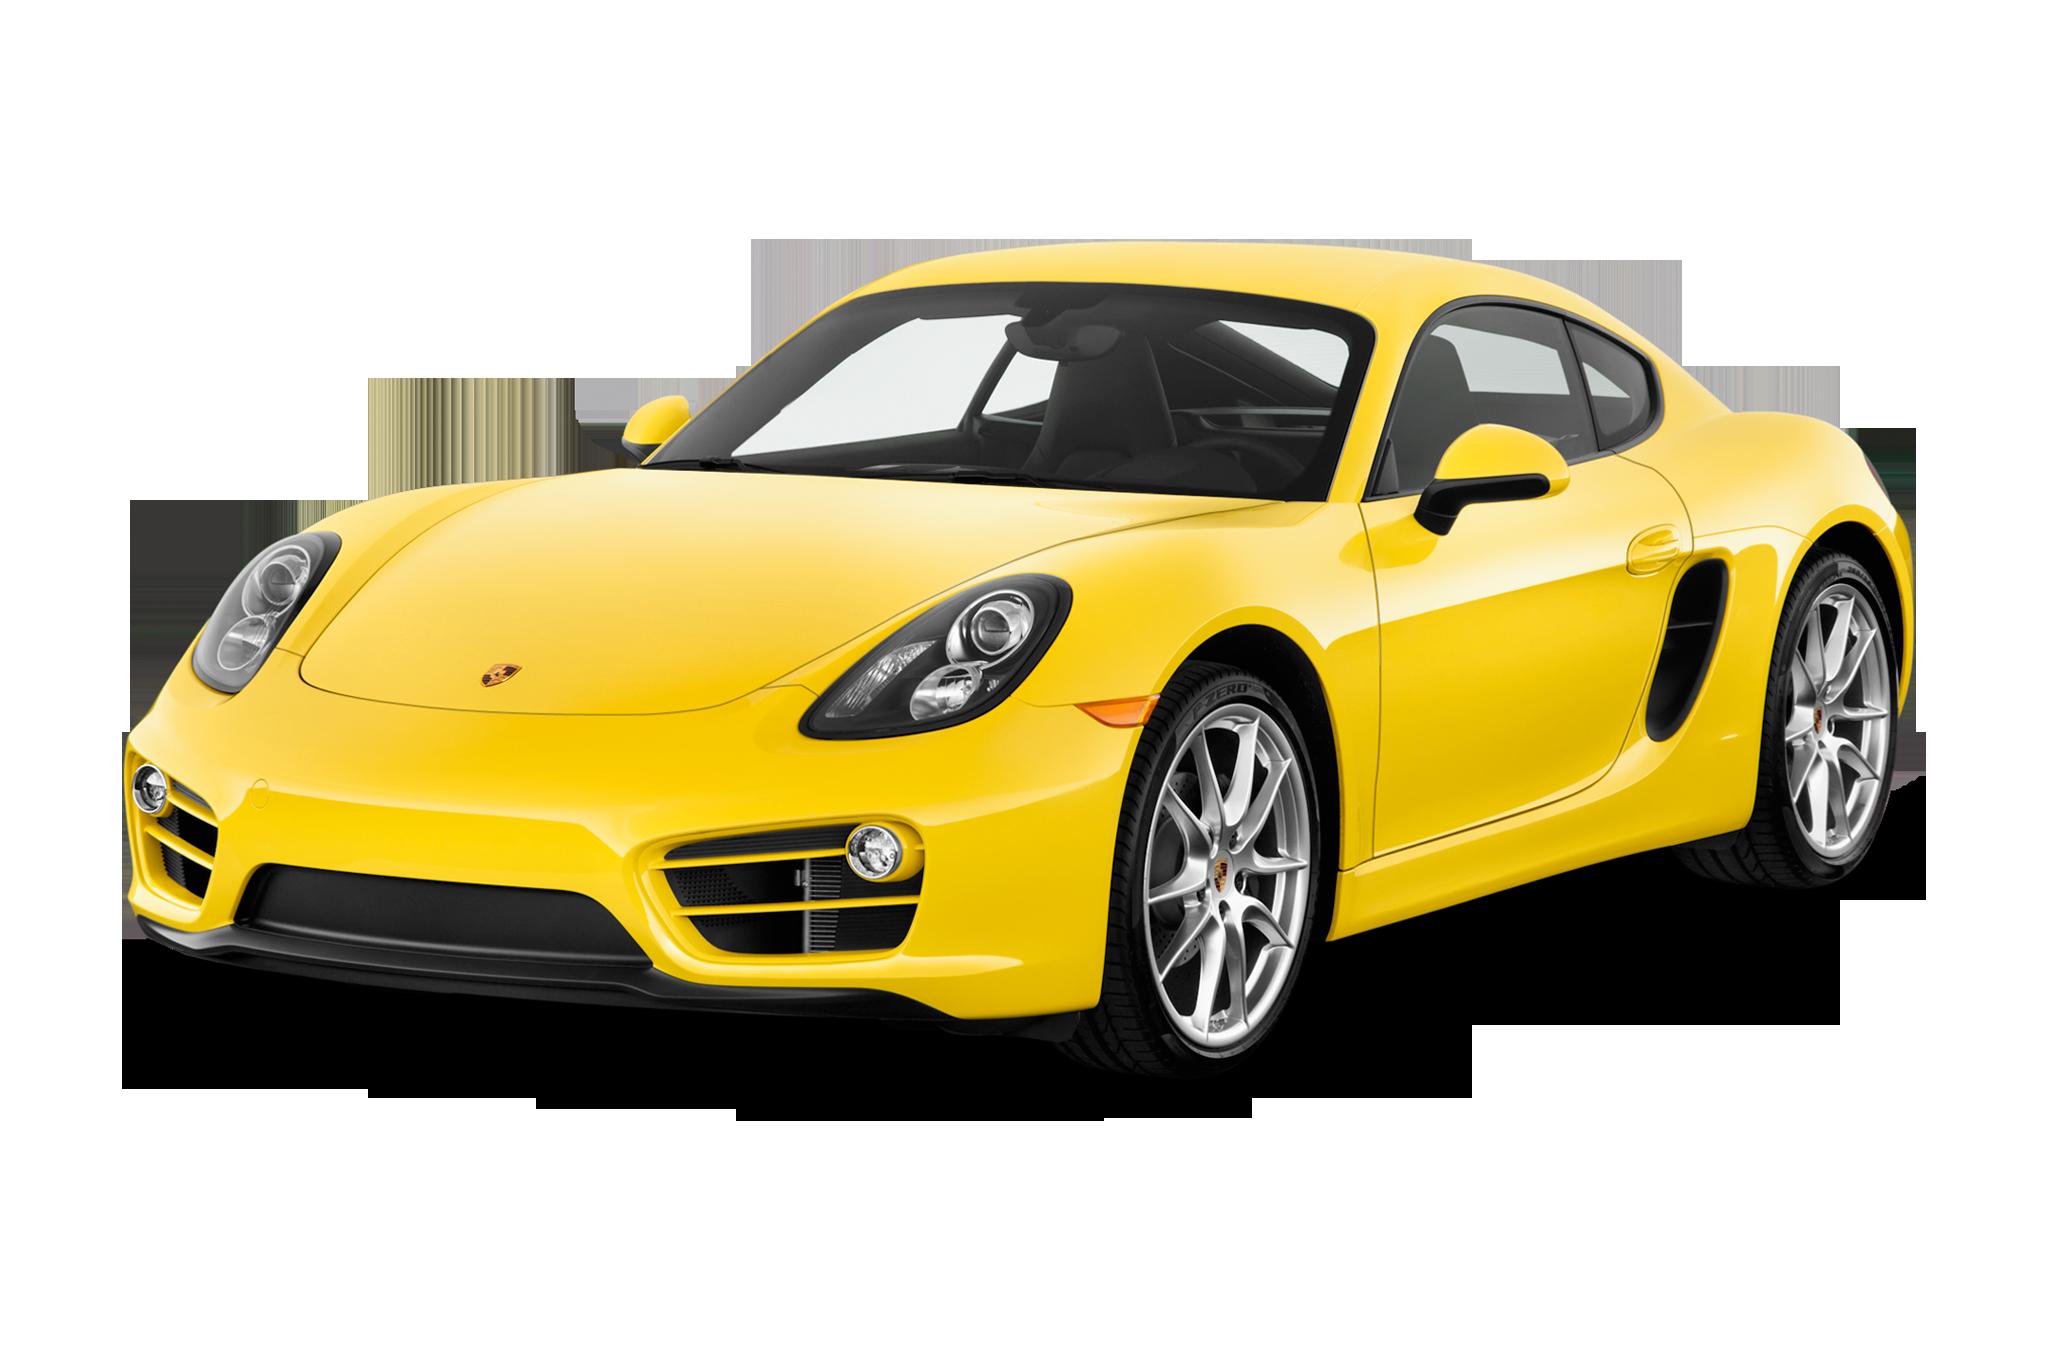 Porsche Png Image Purepng Free Transparent Cc0 Png